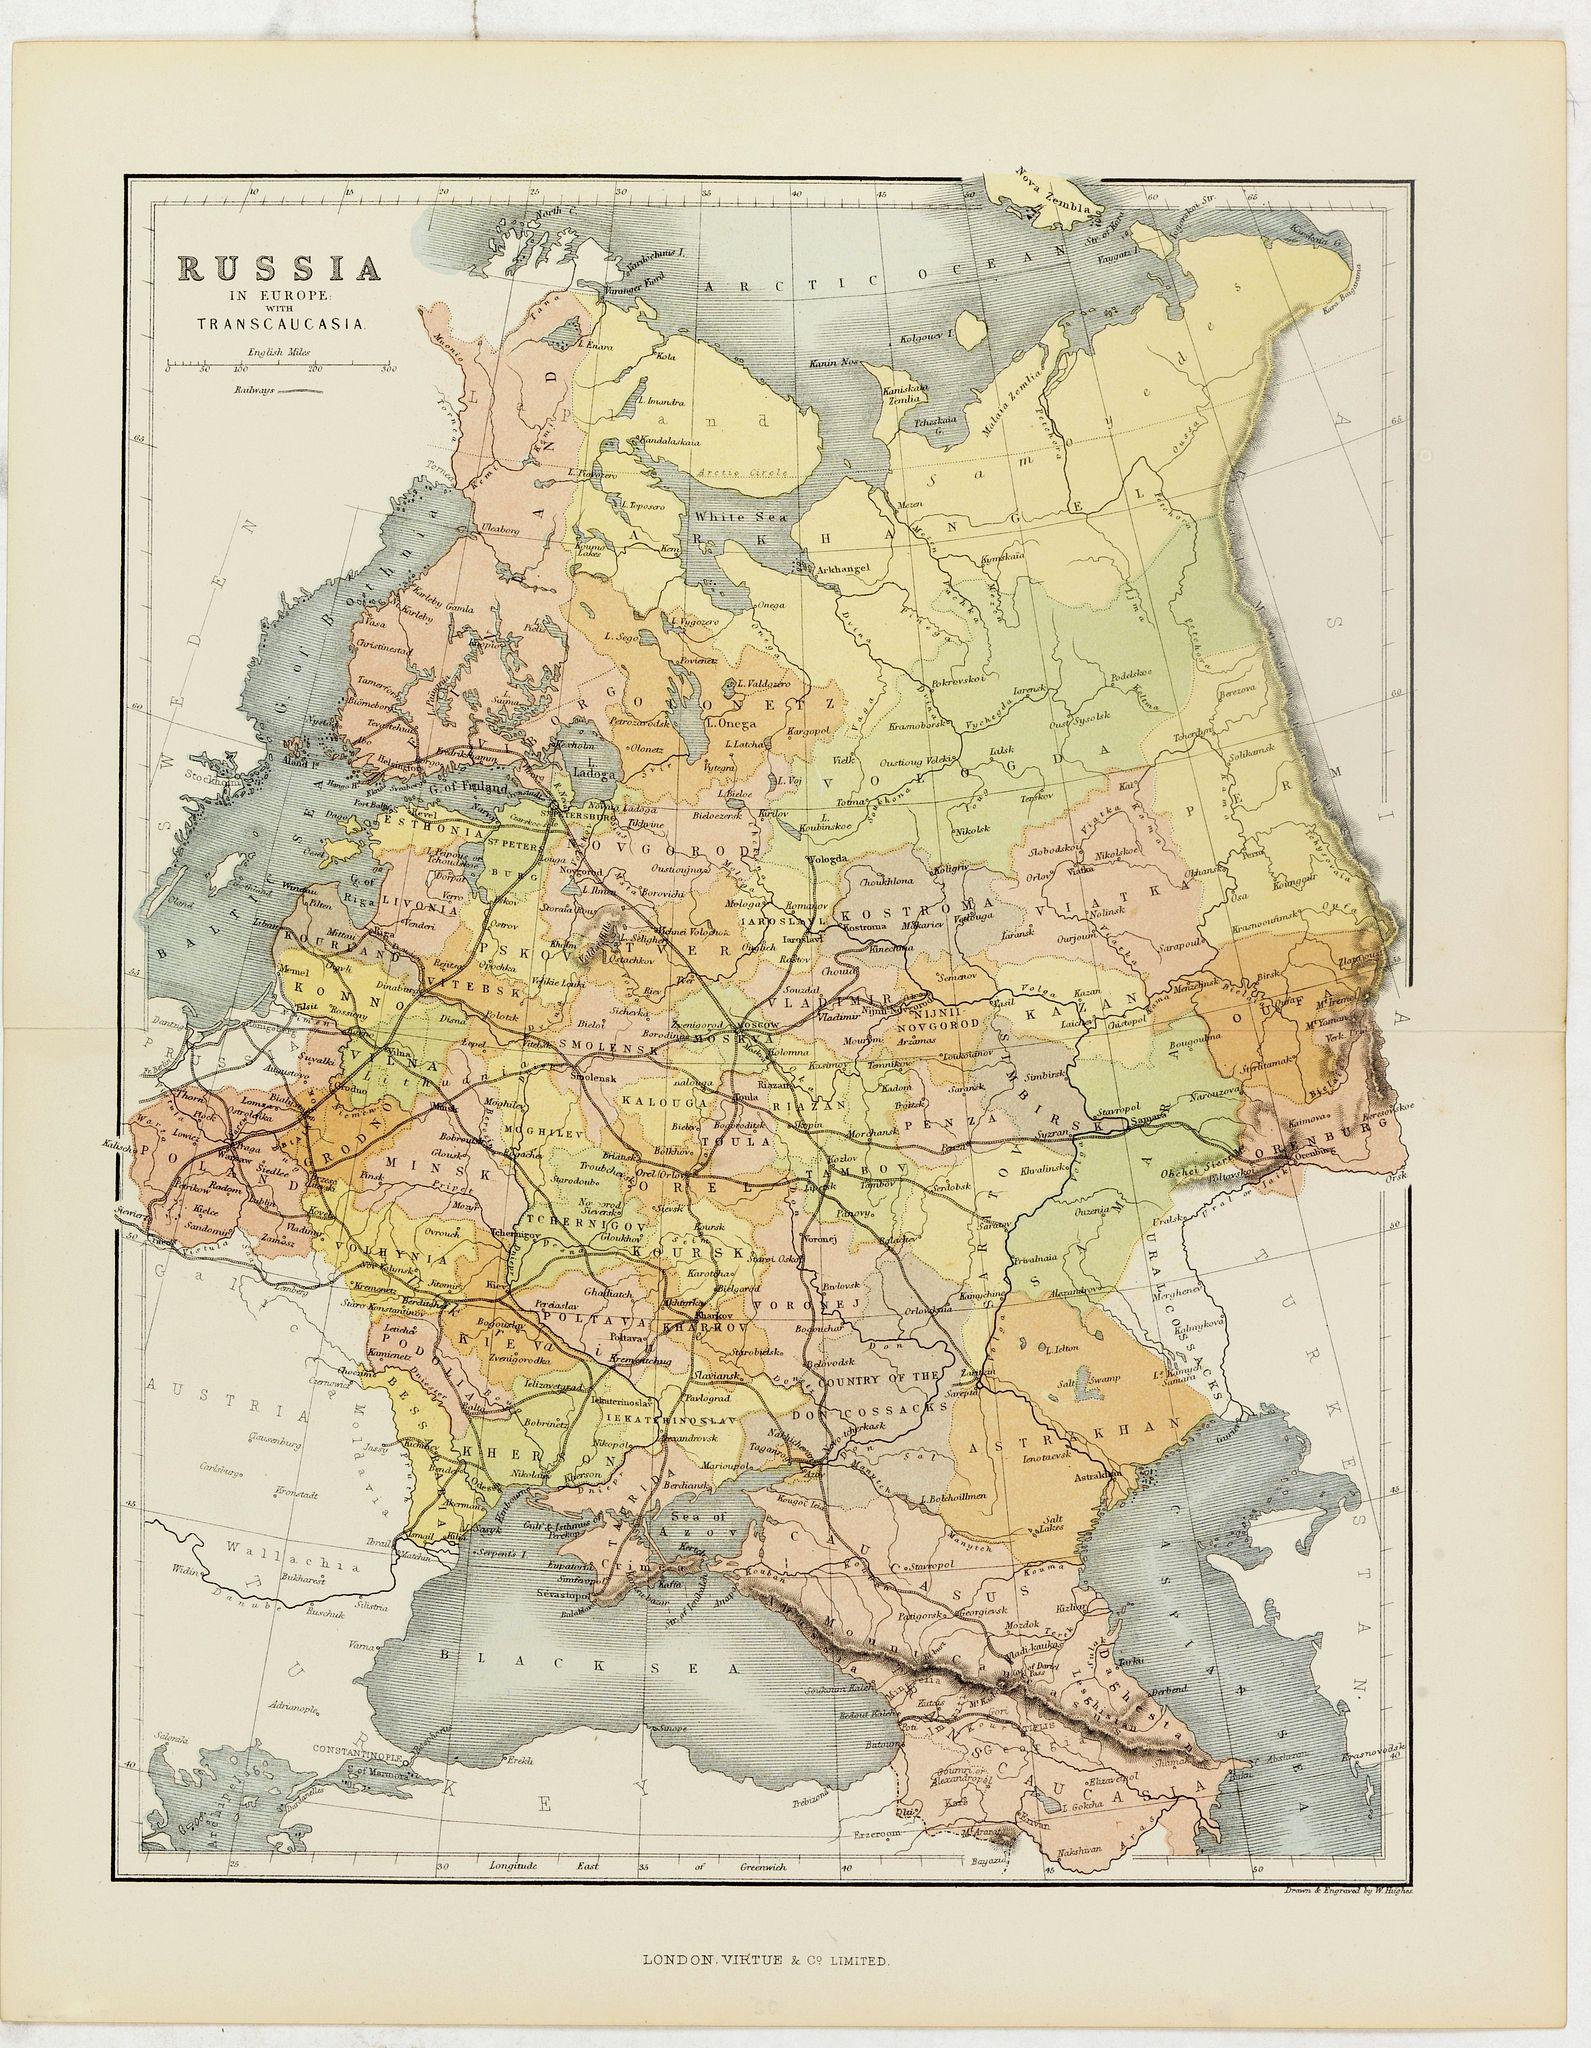 HUGHES, W. -  Russia in Europe with Transcaucasia.